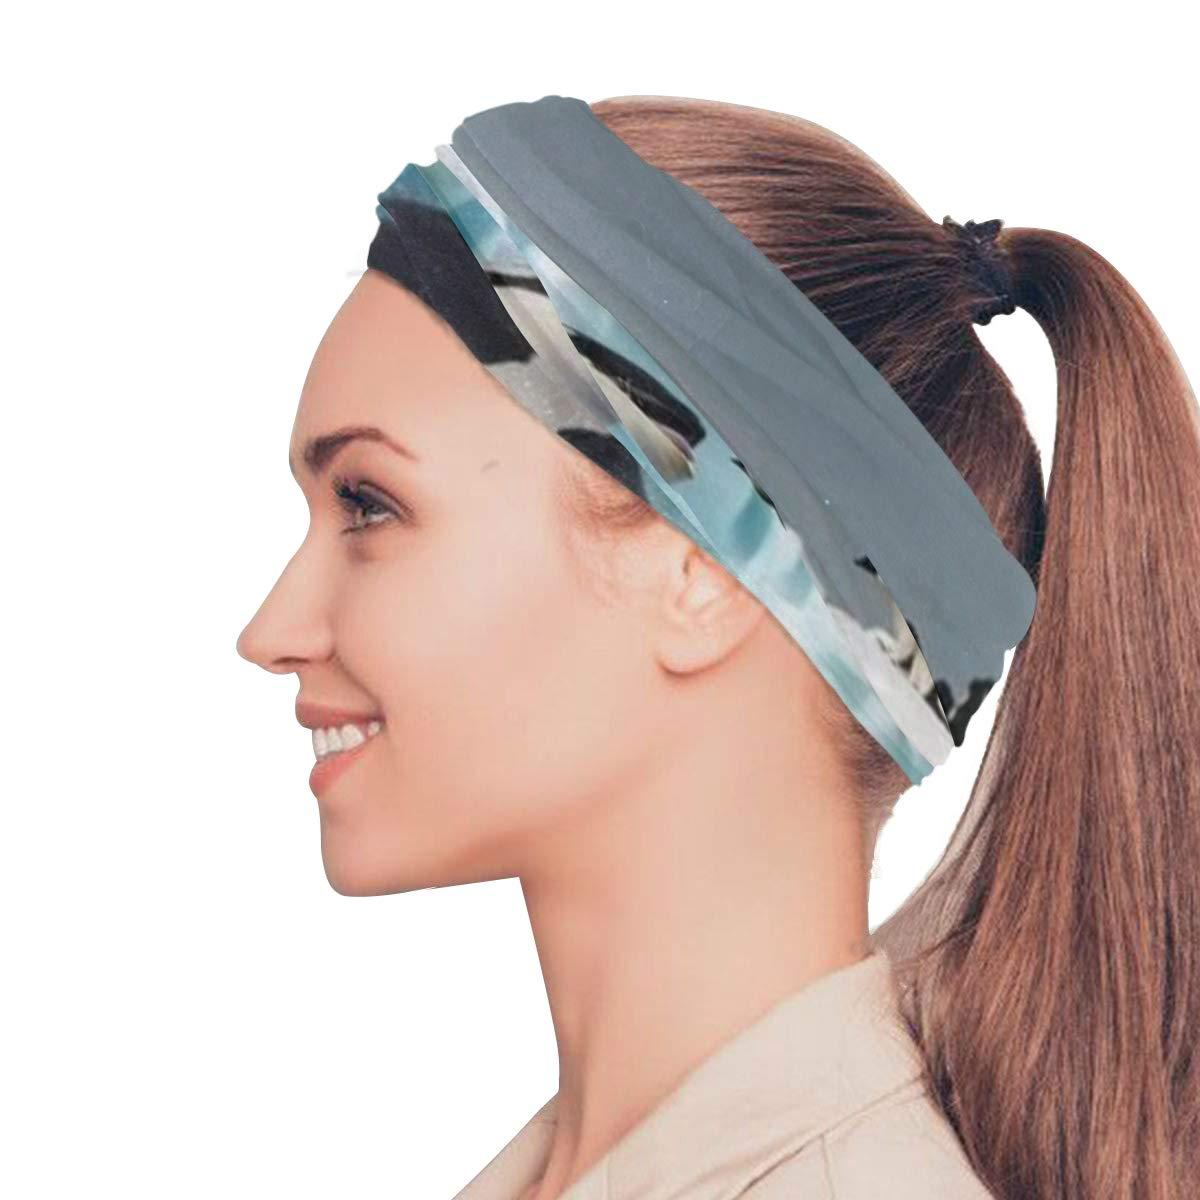 Headwear Skull Multifunctional Headbands Outdoor Magic Scarf As Sport Headwrap,Sweatband,Neck Gaiter,Tube Mask,Face Bandana